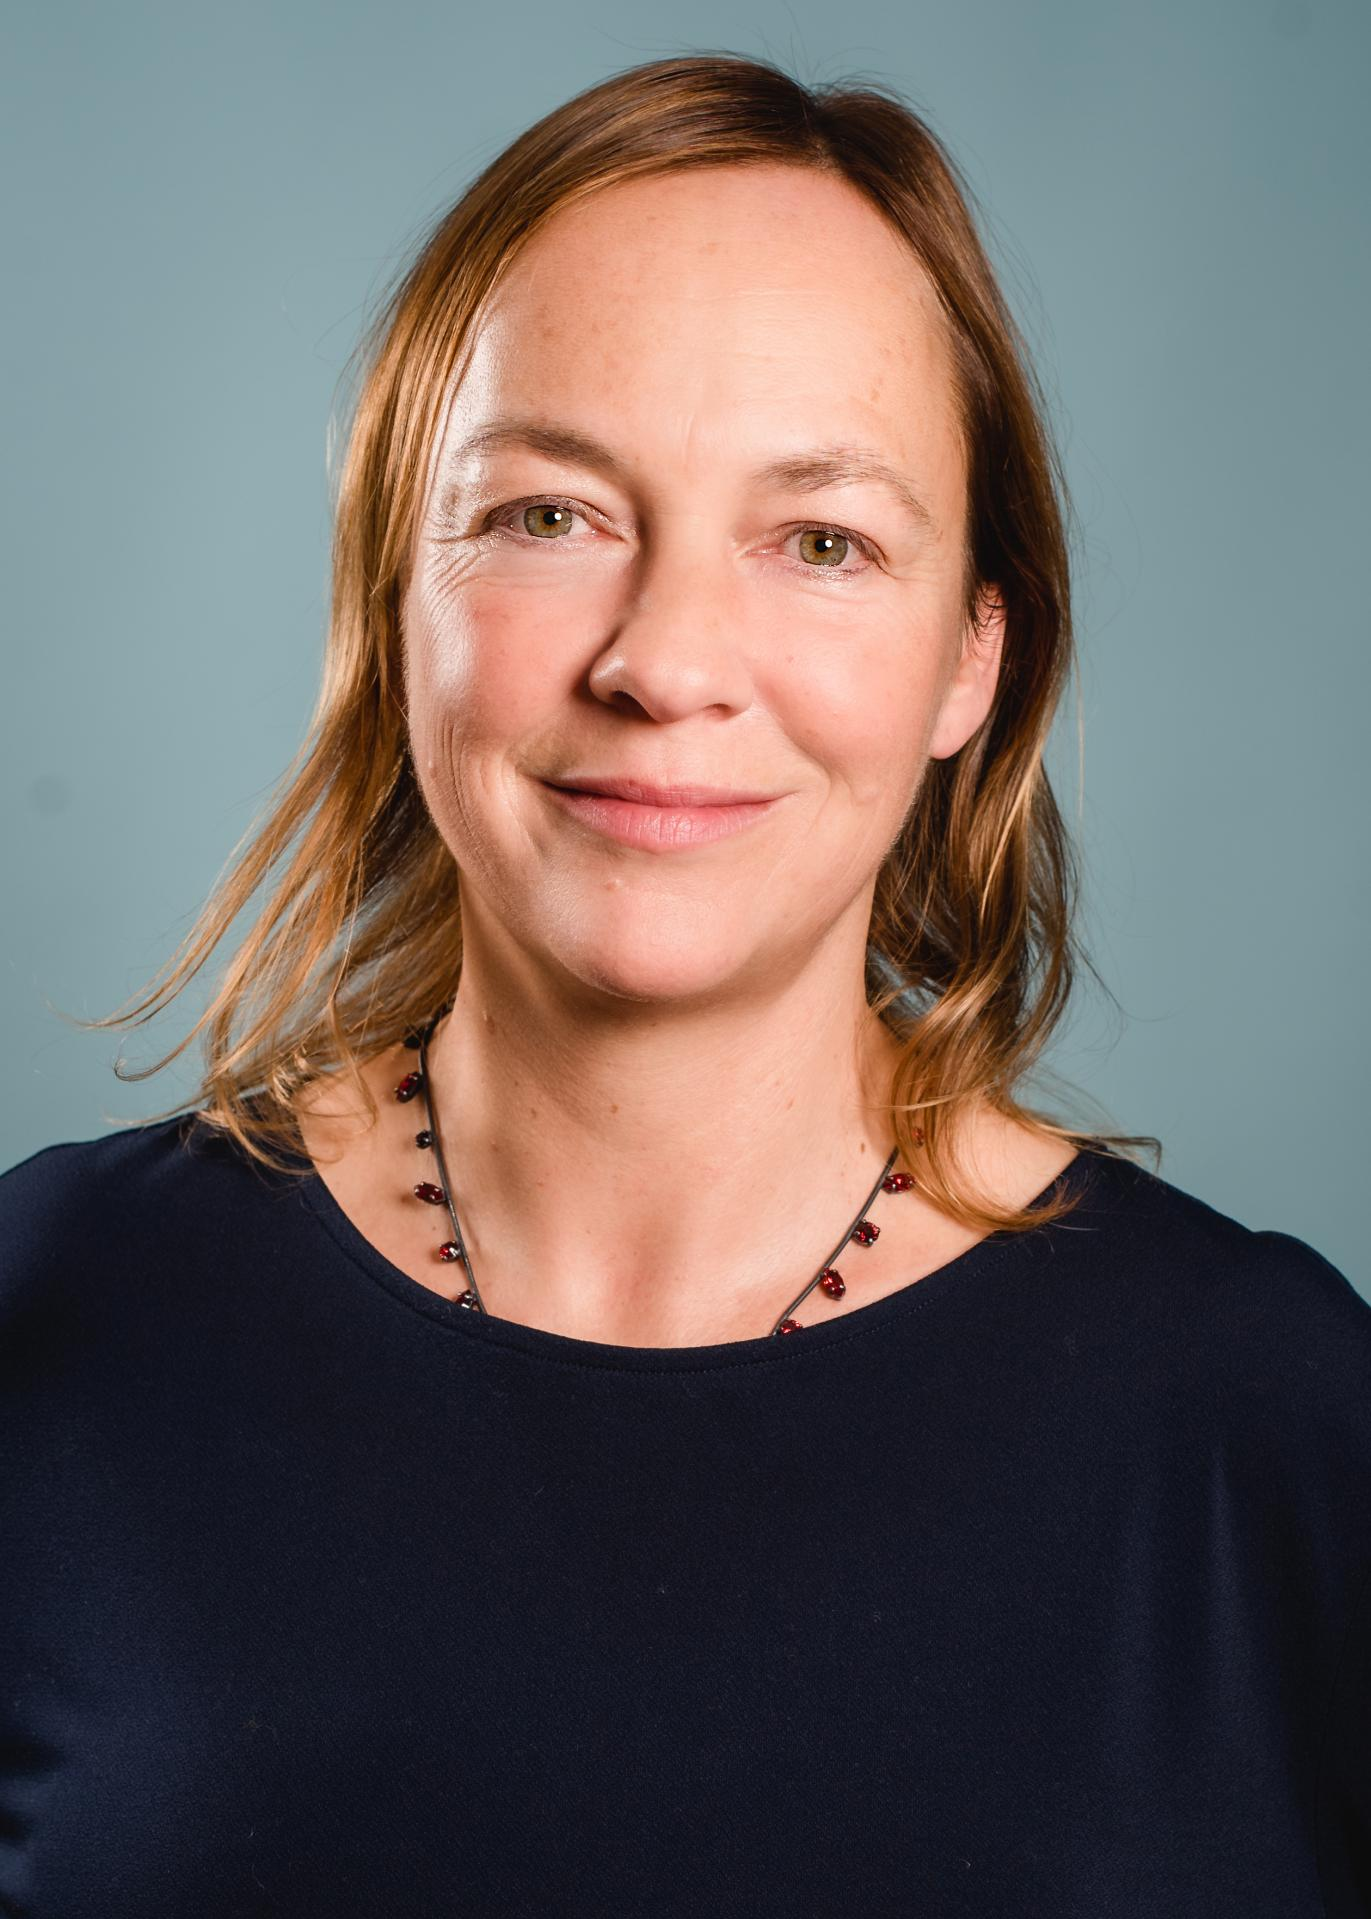 Kerstin Neu